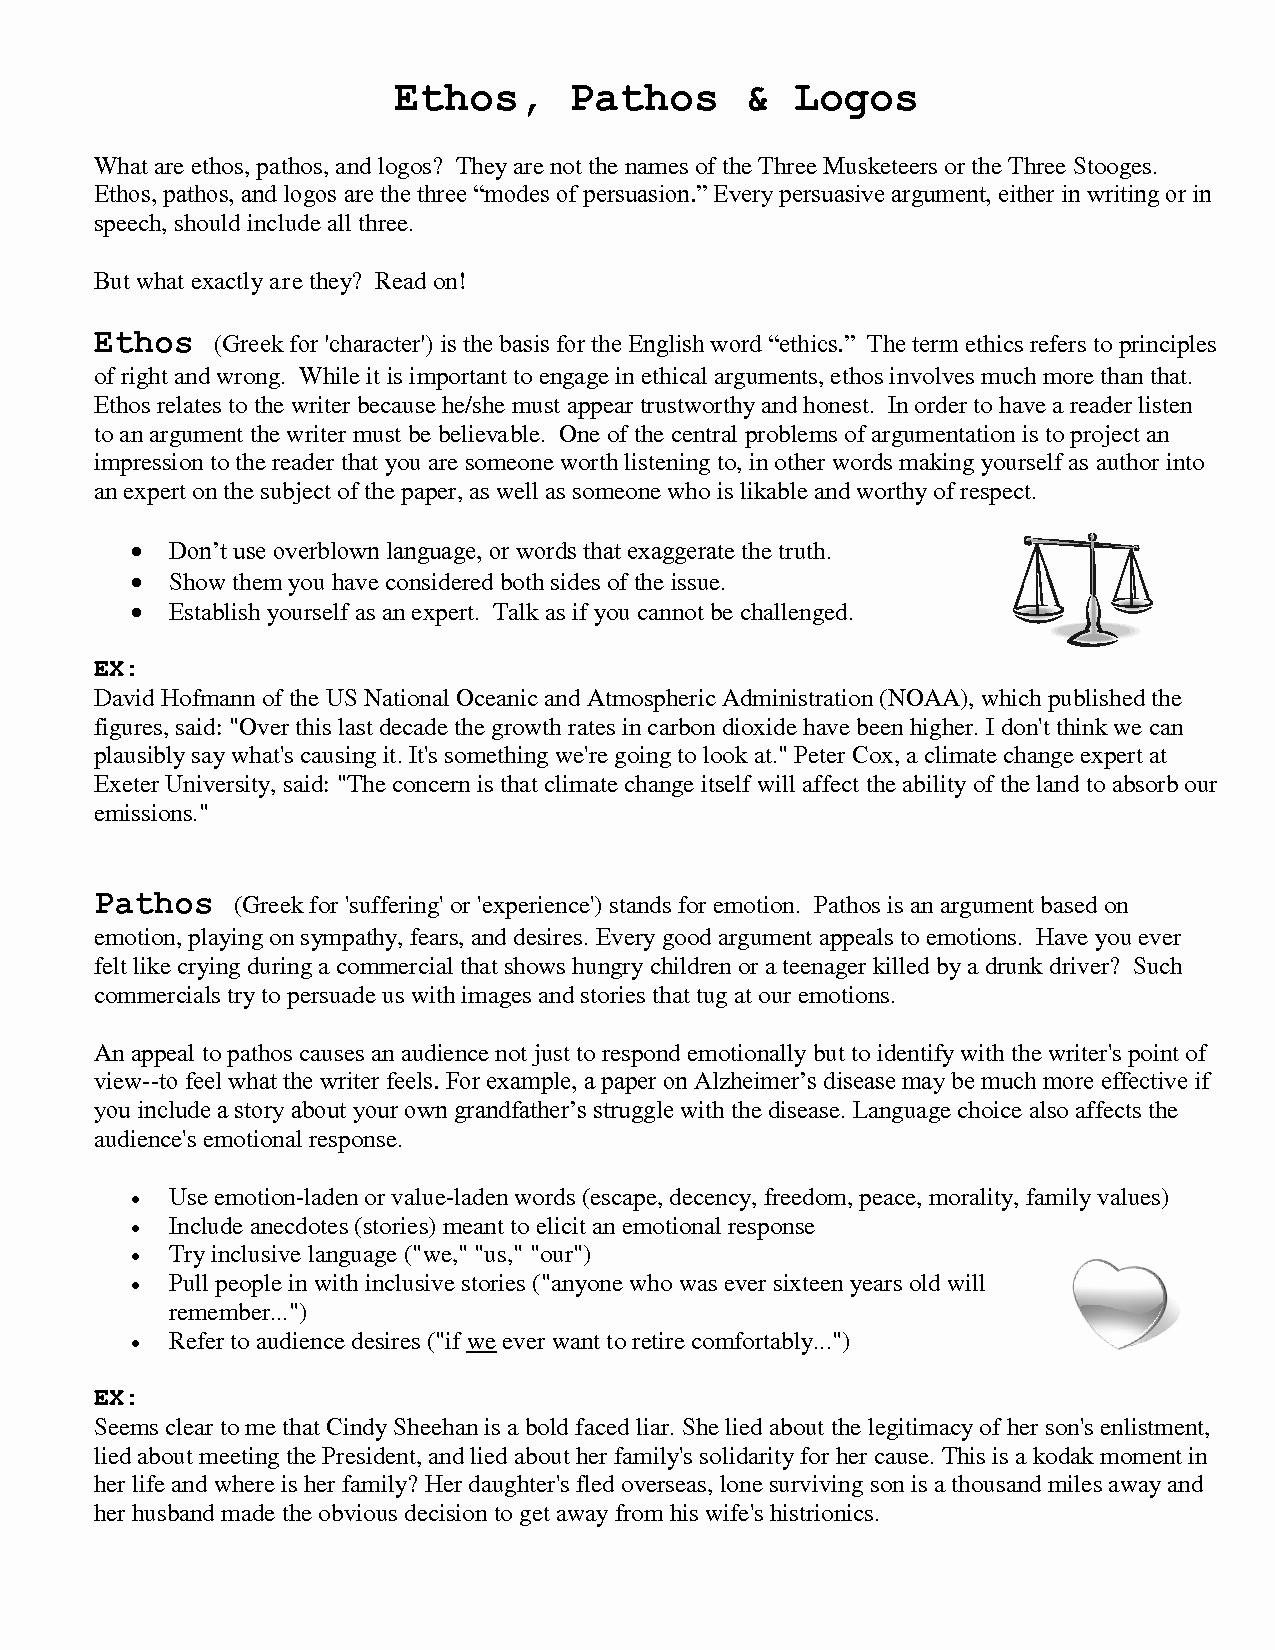 Ethos Pathos Logos Worksheet Ethos Pathos Logos Practice Worksheet Search